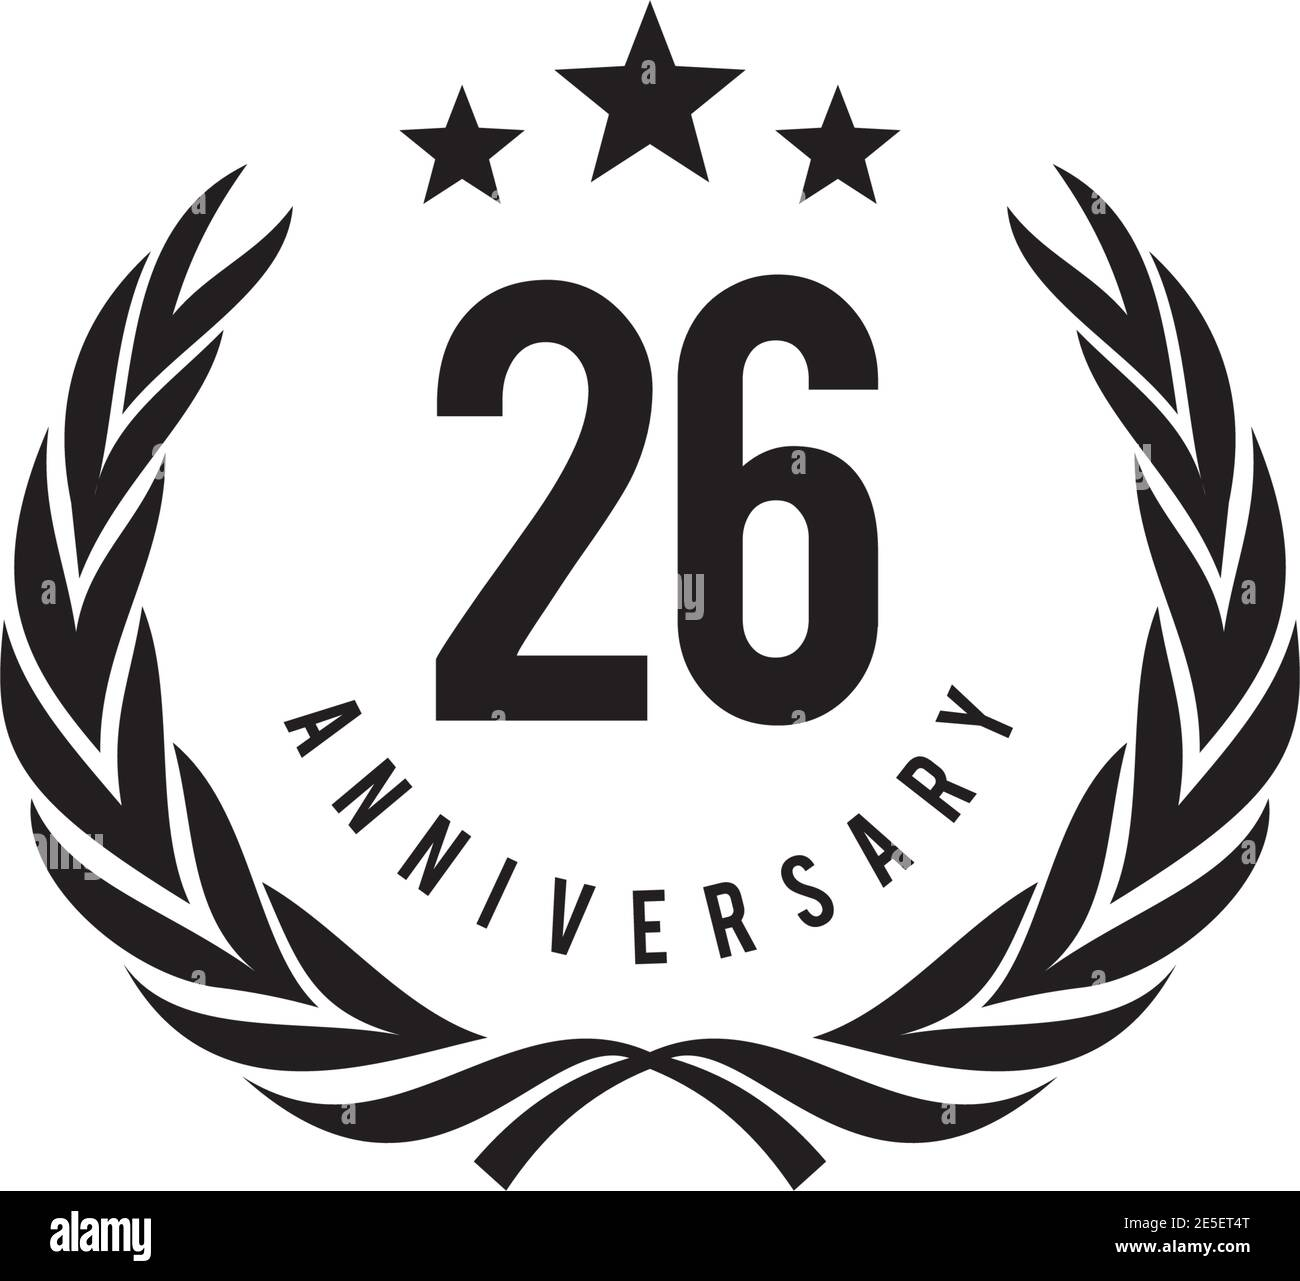 26th year anniversary emblem logo design vector template Stock Vector